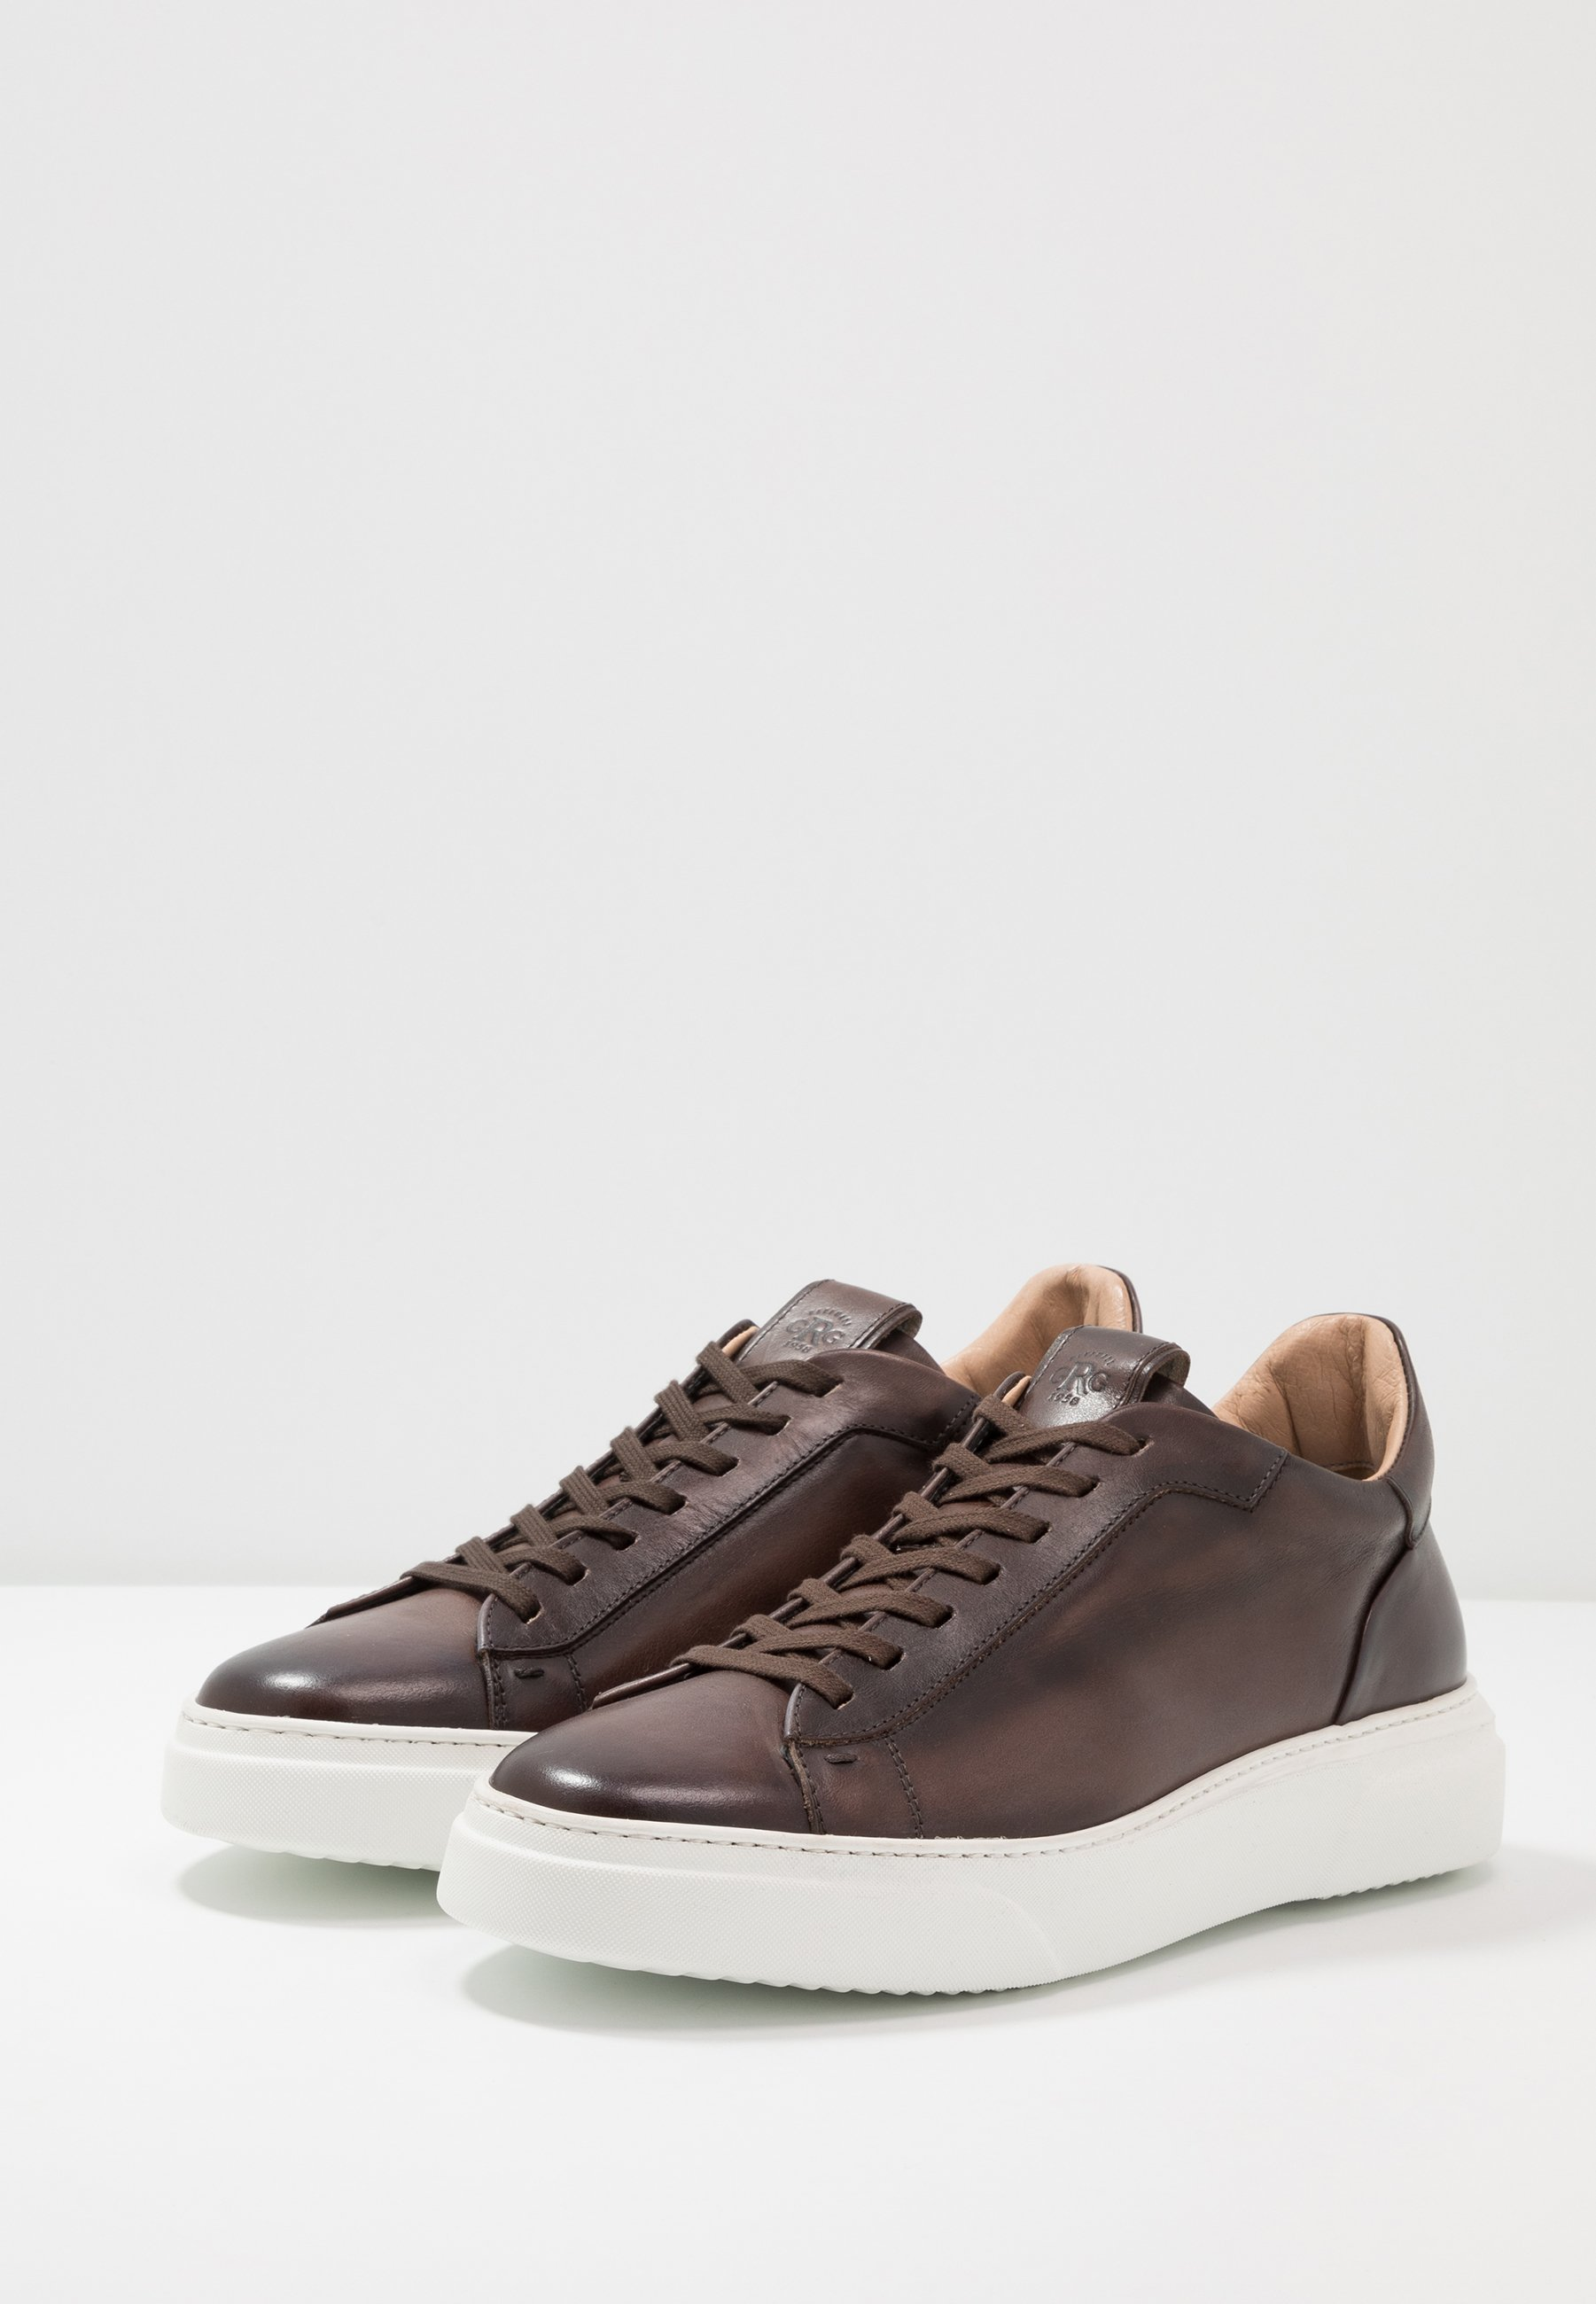 Giorgio 1958 Sneaker low - caffe/braun - Herrenschuhe h1aHK